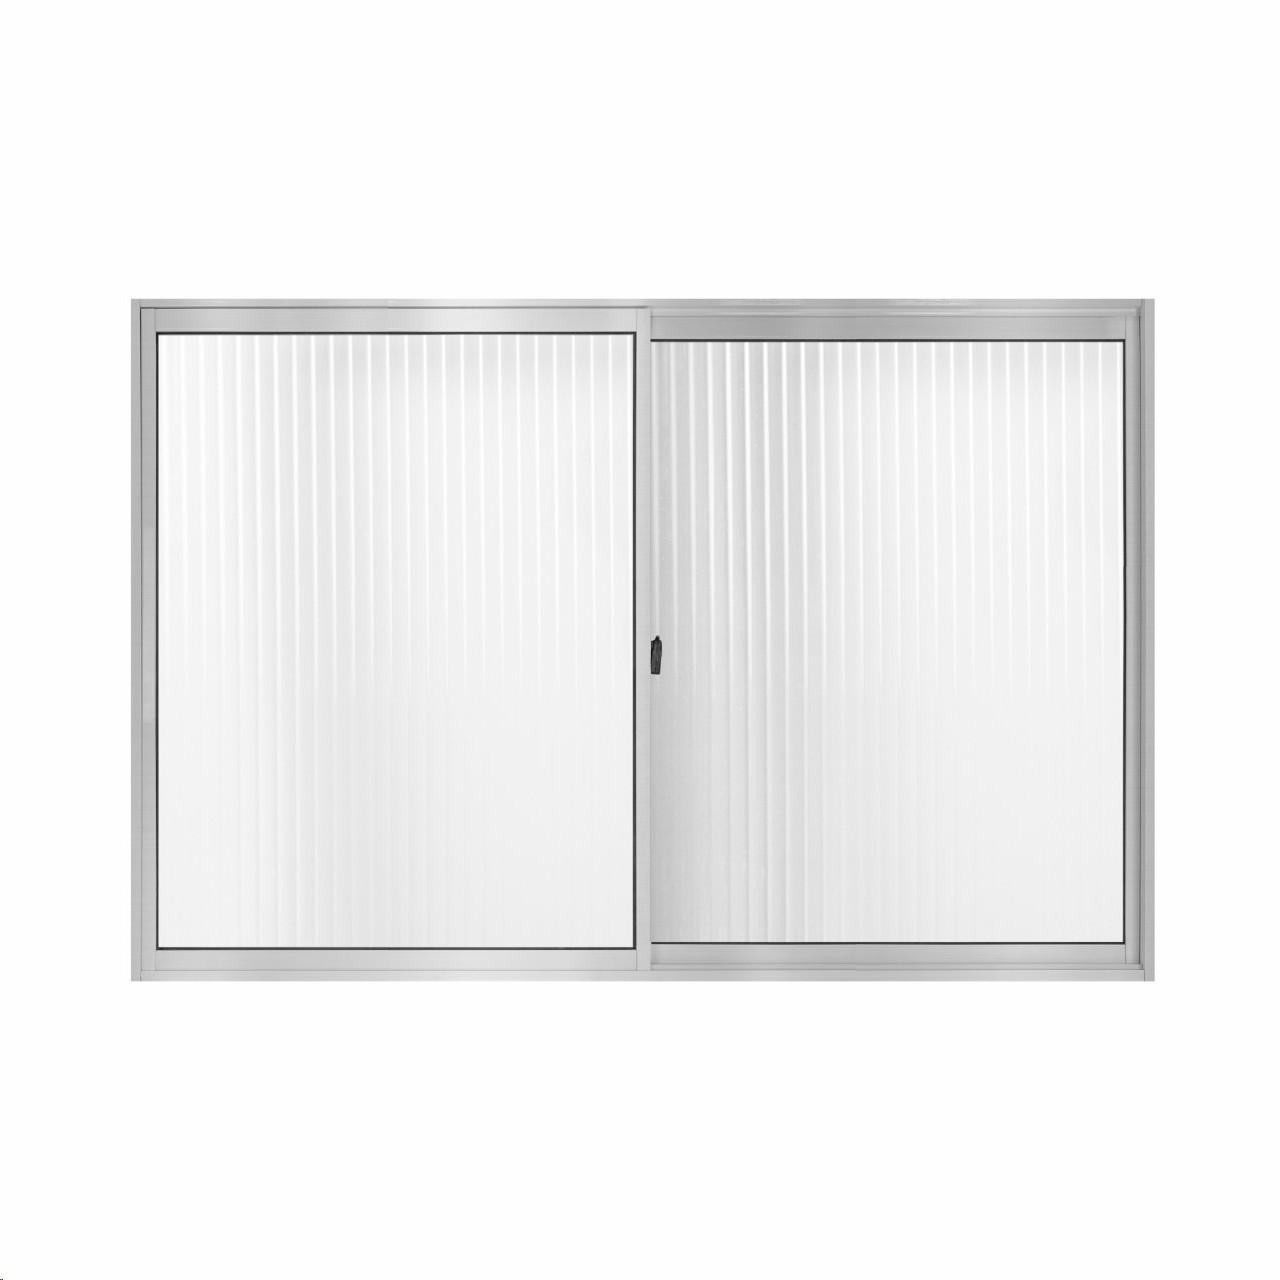 Janela de Correr Slim de Aluminio 2 Folhas 100x150cm Vidro Canelado Branca - Aluvid